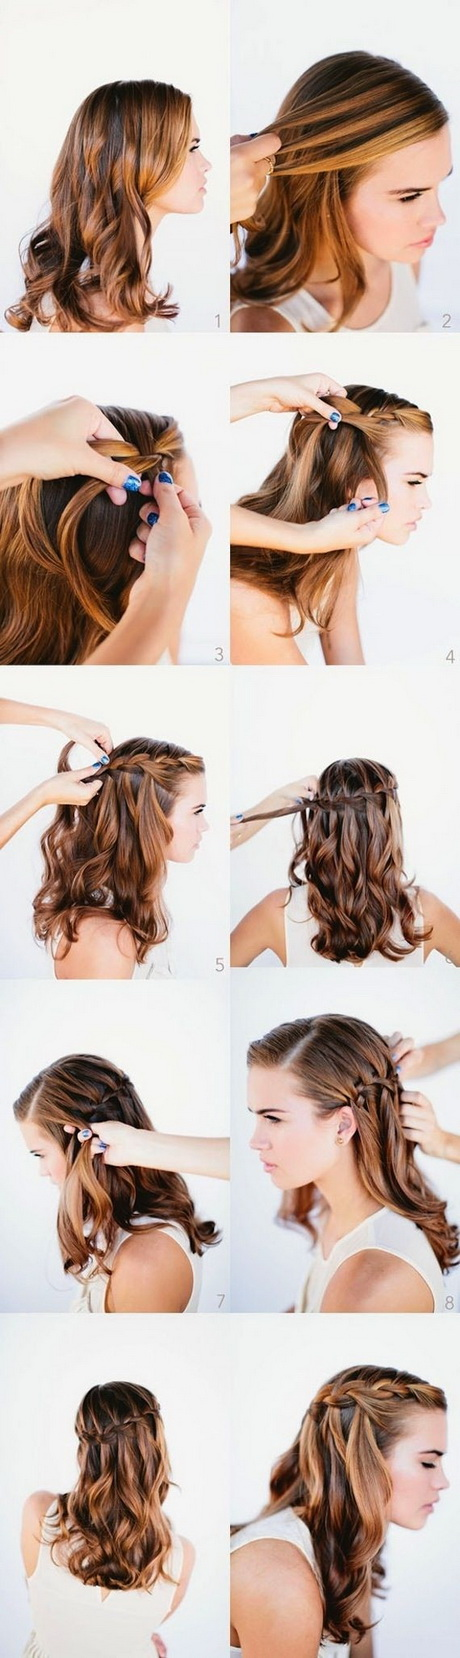 10 Best Waterfall Braids: Hairstyle Ideas For Long Hair U2013 PoPular U2026